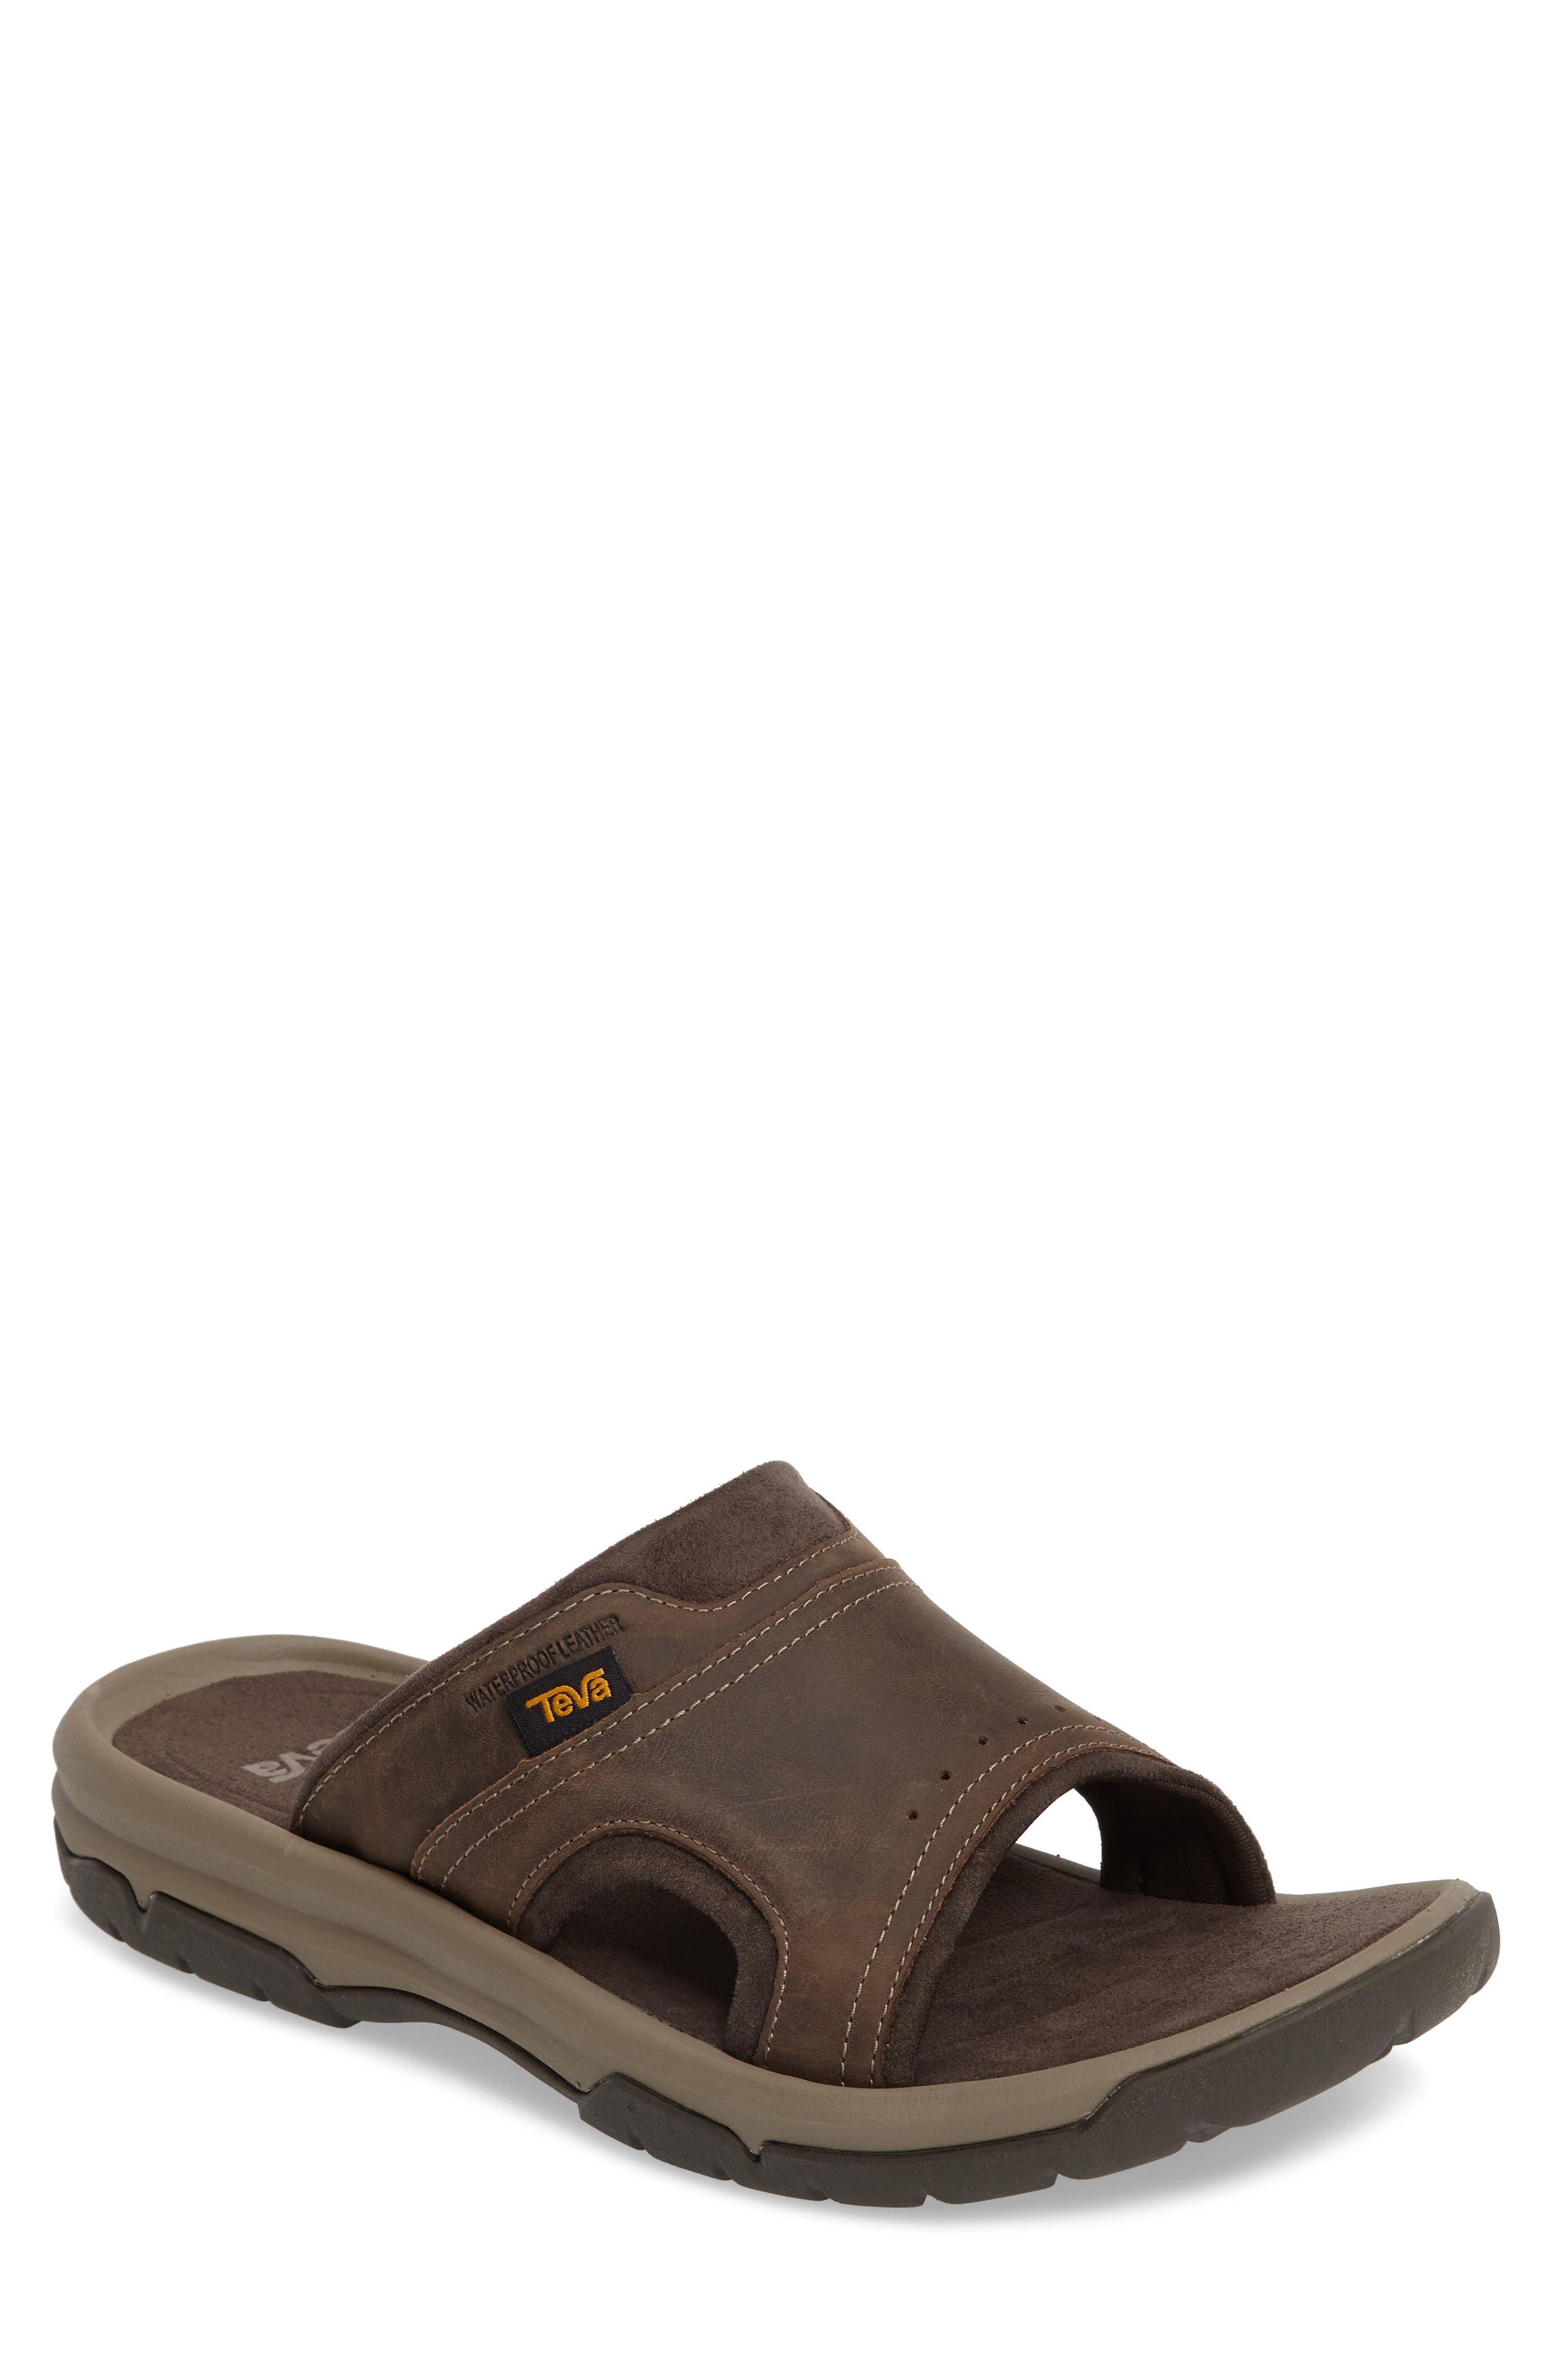 Alternate Image 1 Selected - Teva Langdon Slide Sandal (Men)